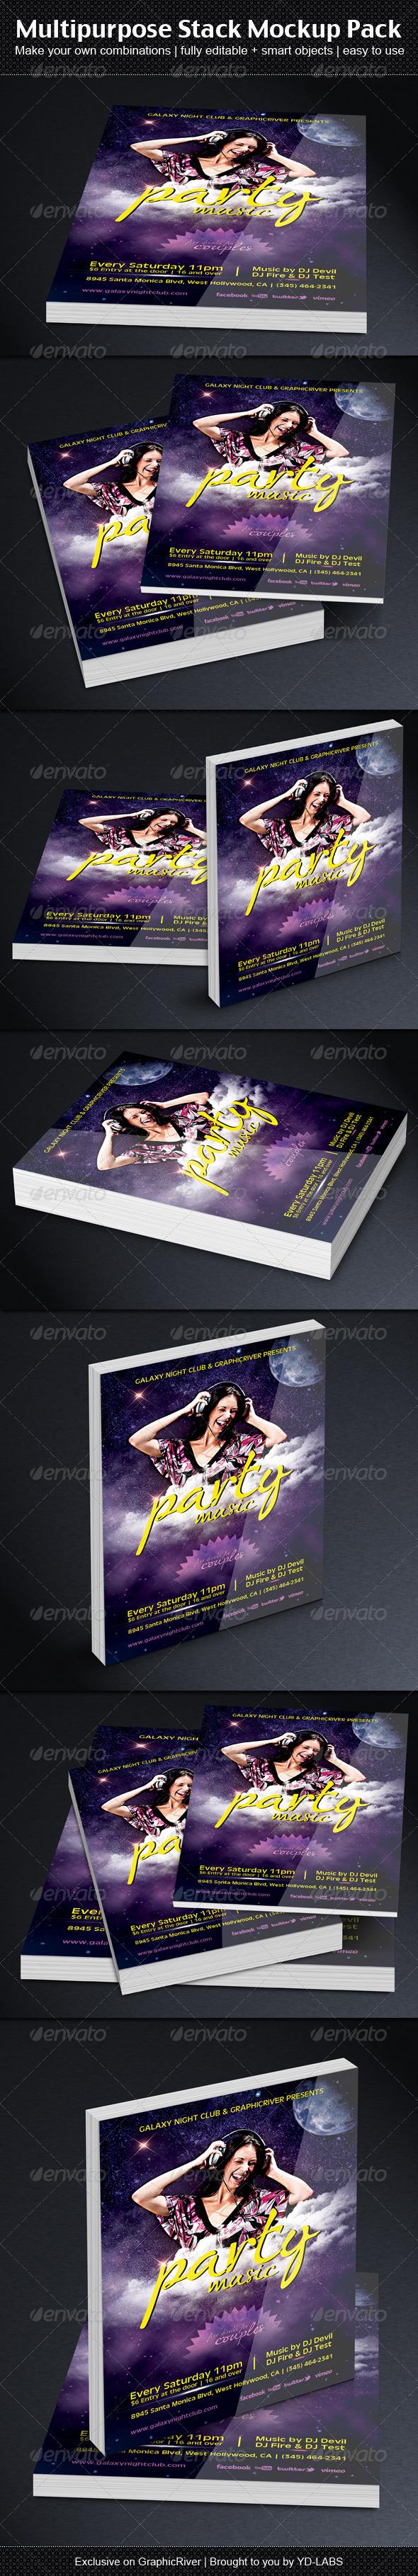 Multipurpose Stack Mockup Pack - Books Print